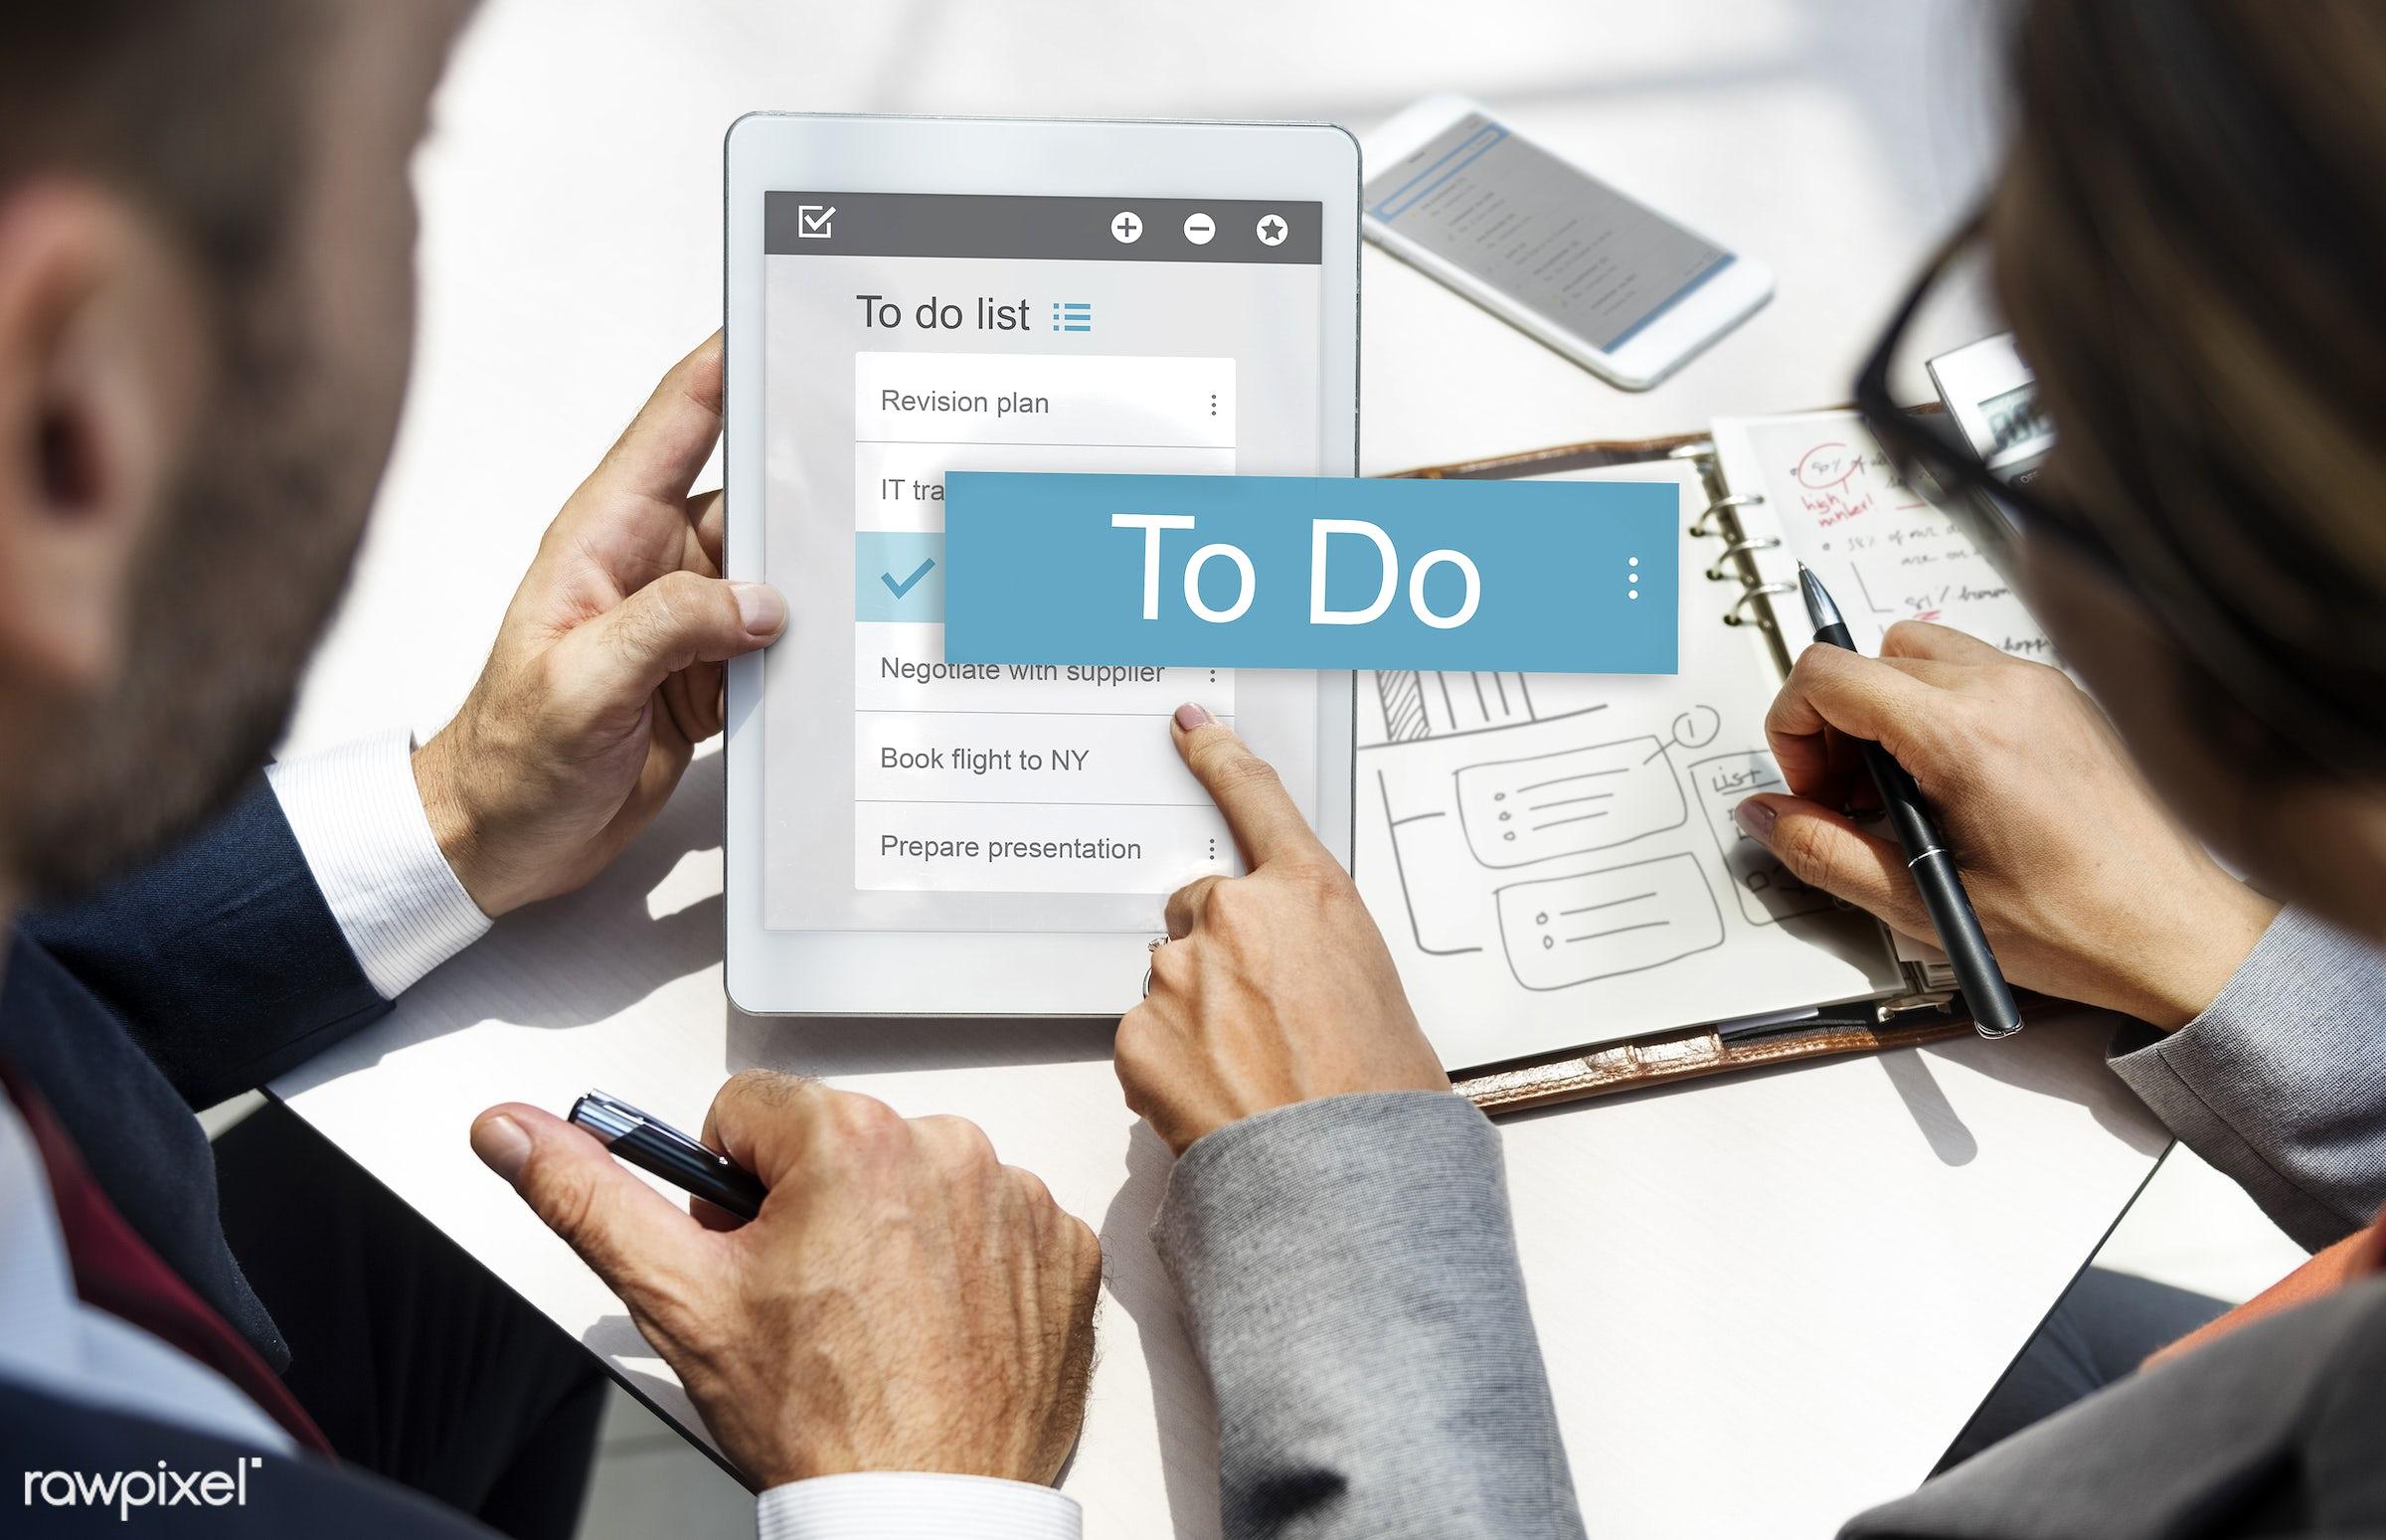 checklist, agenda, app, appointment, business, businessman, businessmen, businesswoman, businesswomen, calculator, calendar...